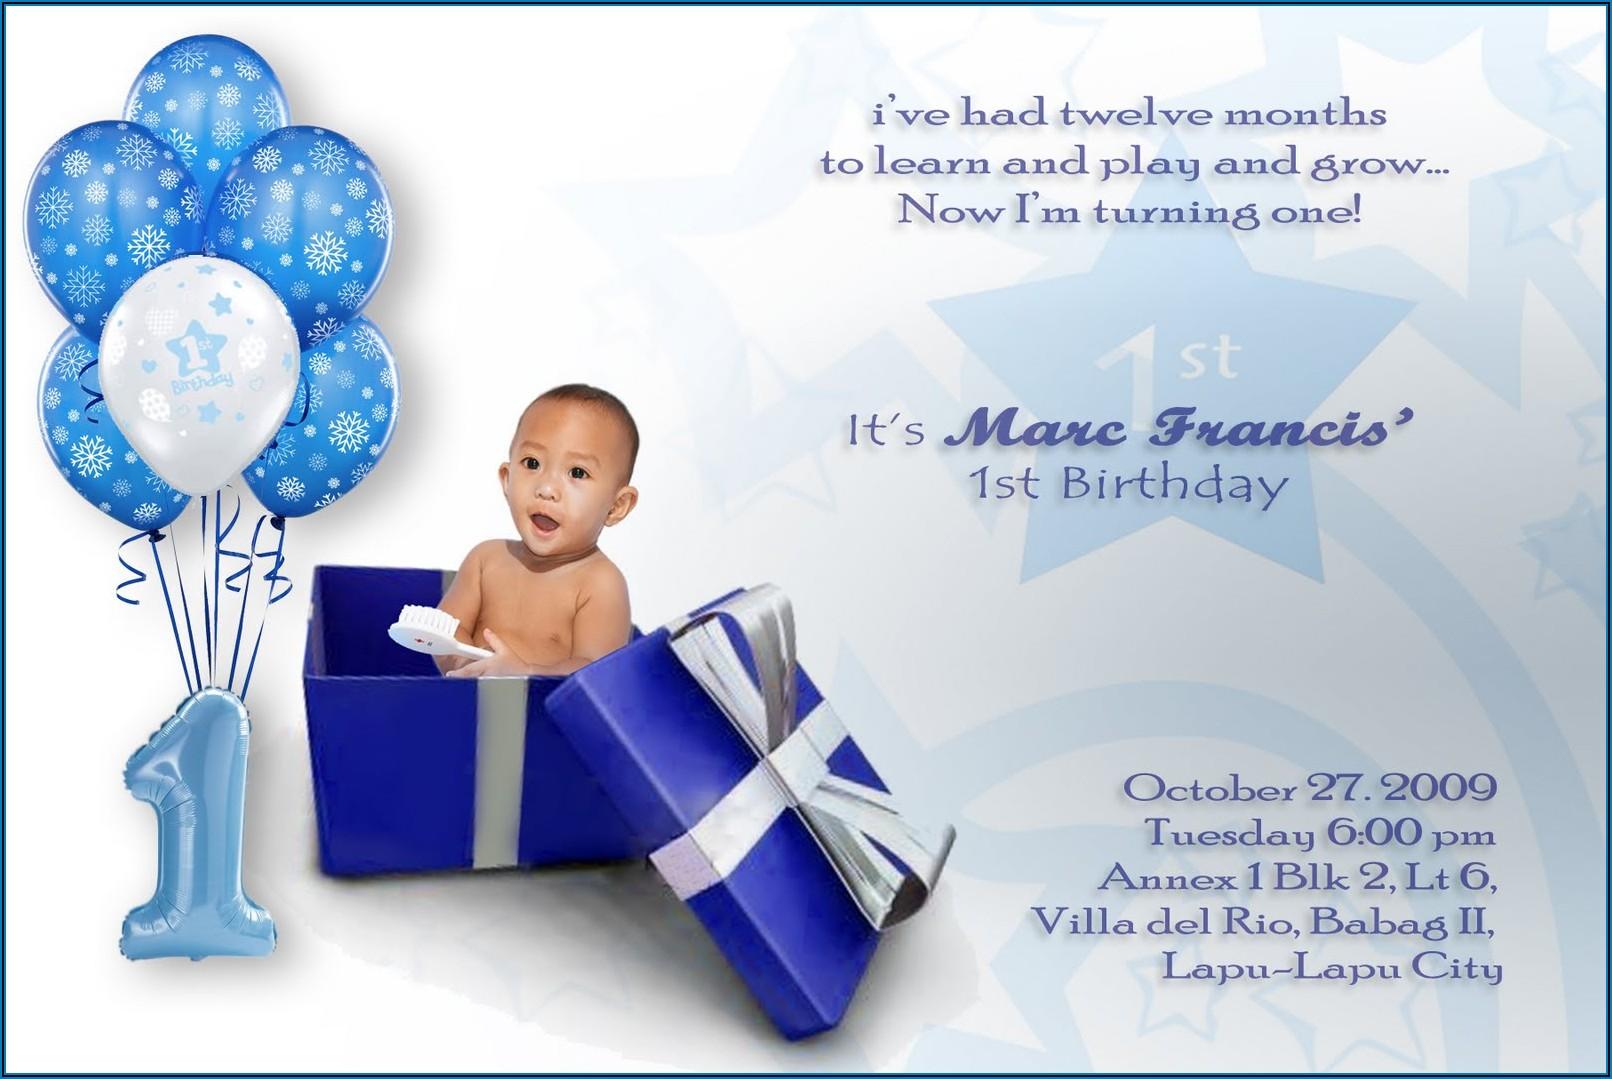 1st Birthday Invitation Card For Baby Boy Wording